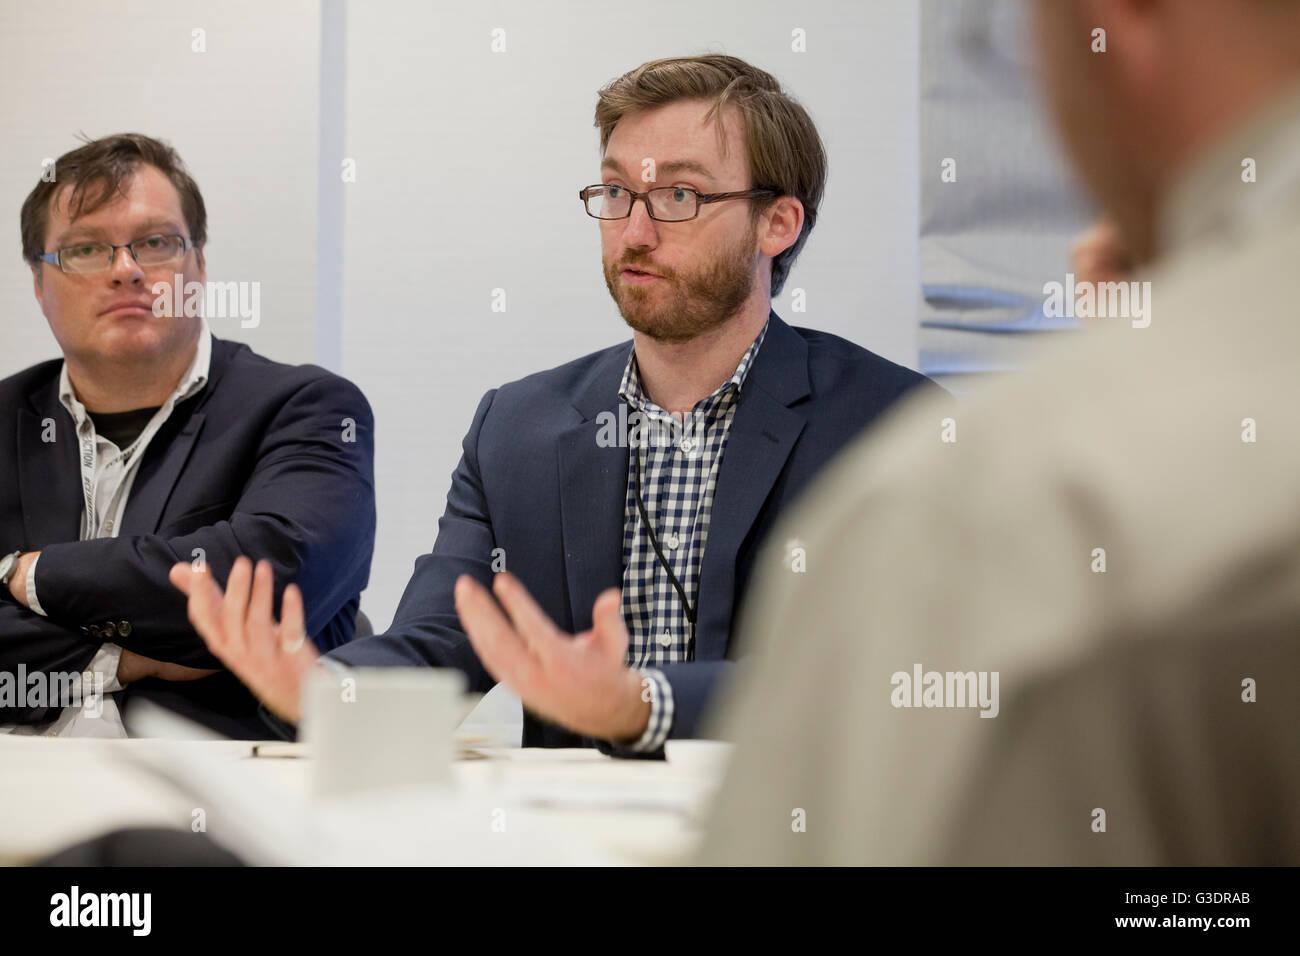 Geschäftsmann in einem Büro-Business-Meeting - USA Stockbild